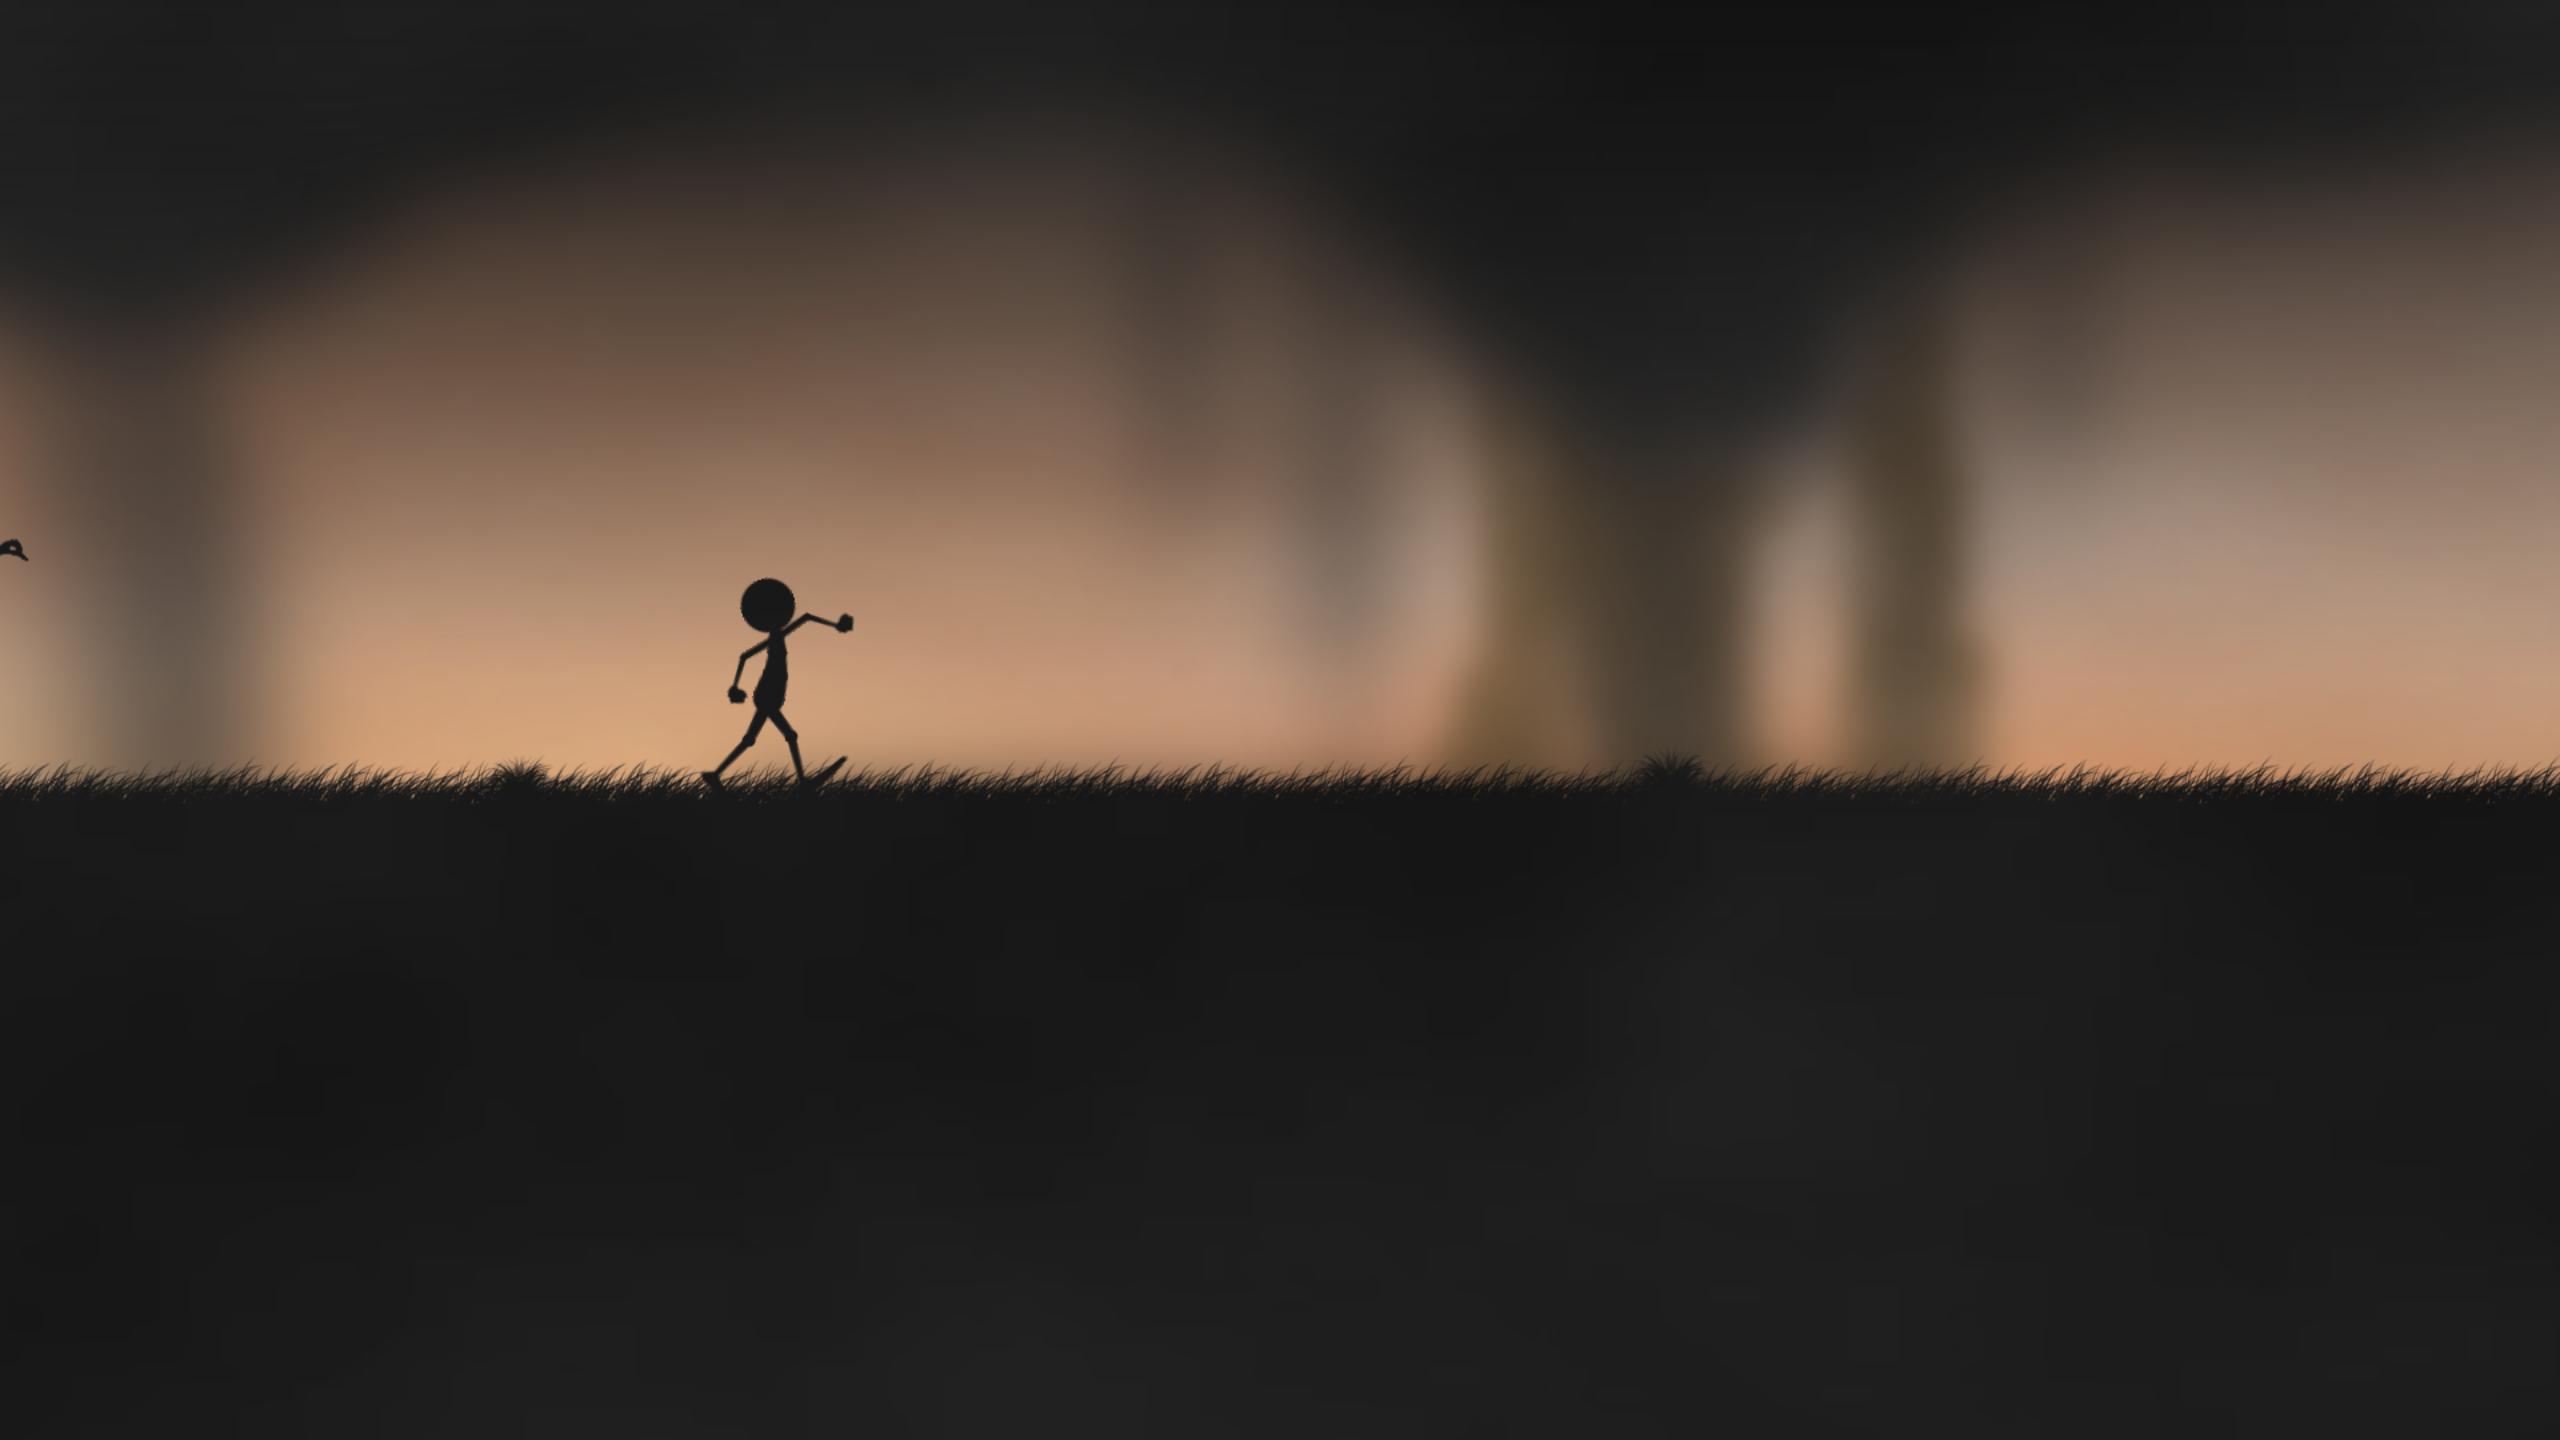 apocalypse-runner-2